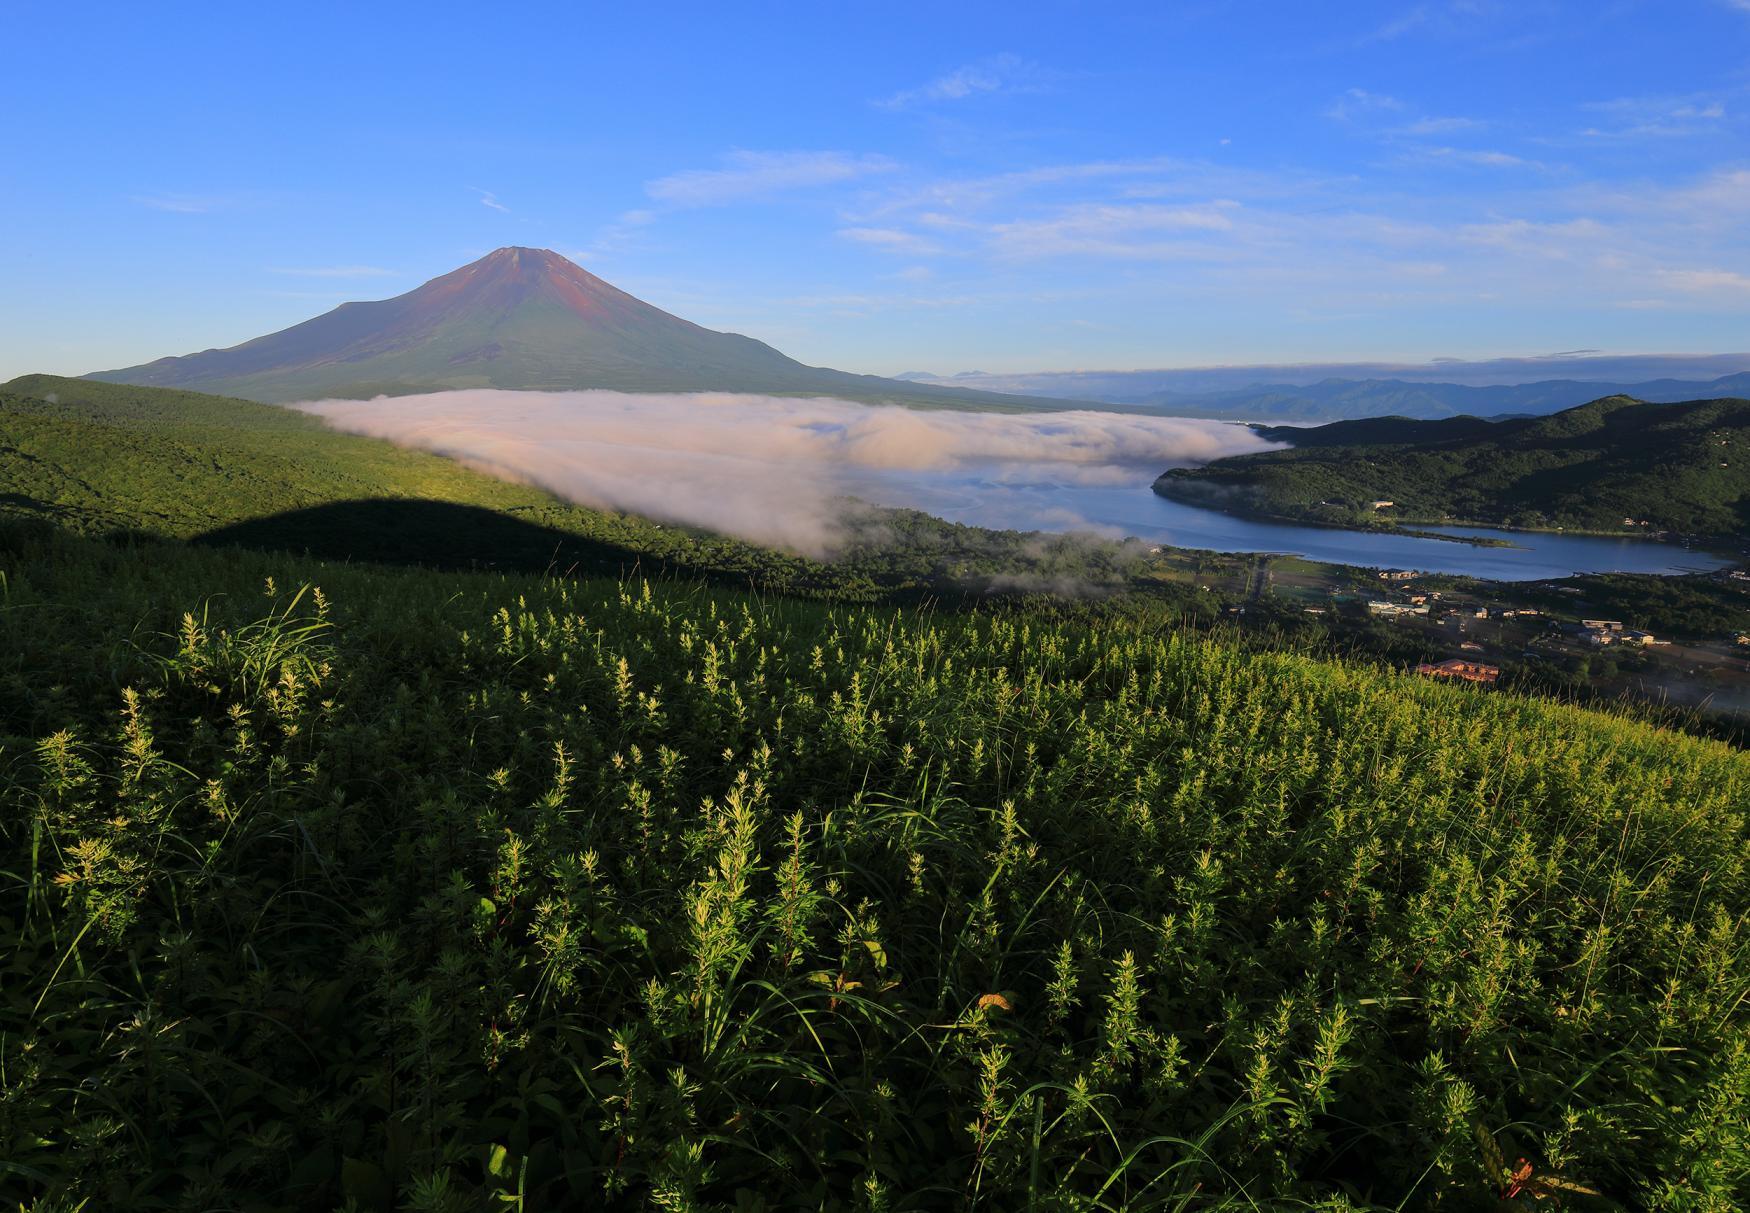 Mt. Fuji Viewing